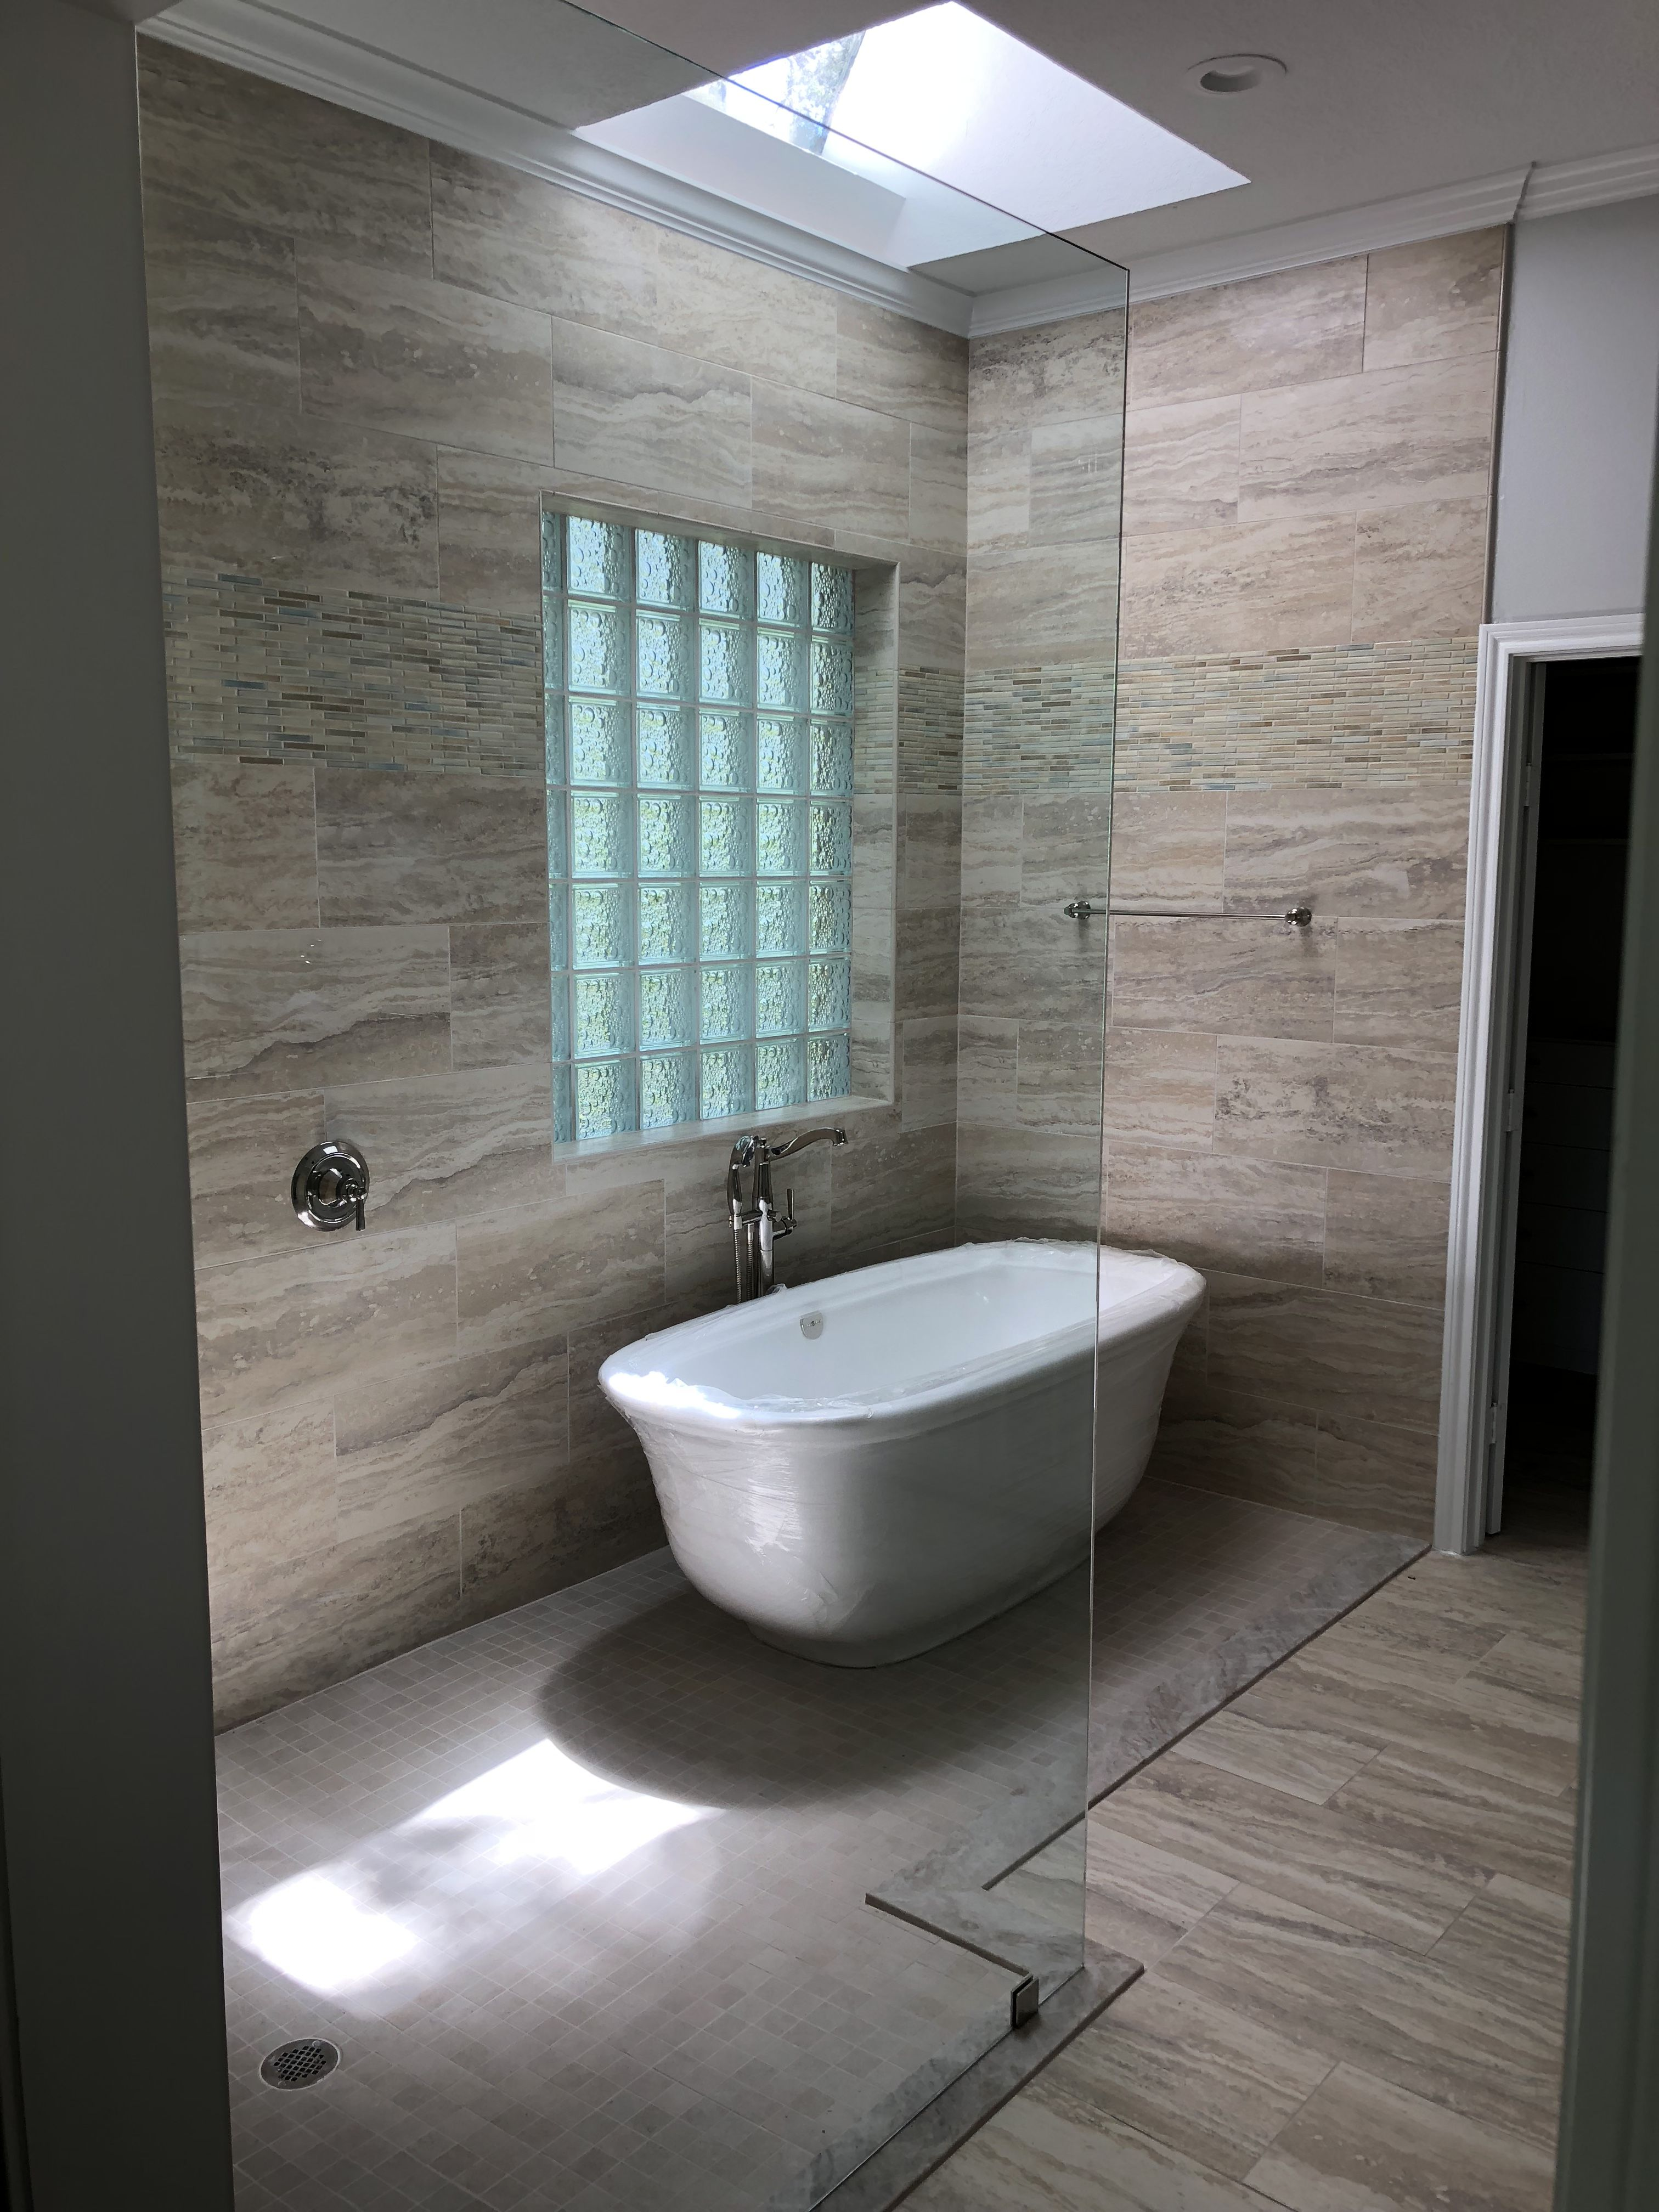 Pin By Five Star Floors On Bathroom Ideas Inexpensive Bathroom Remodel Bathrooms Remodel Small Bathroom Master bedroom badroom tiles design